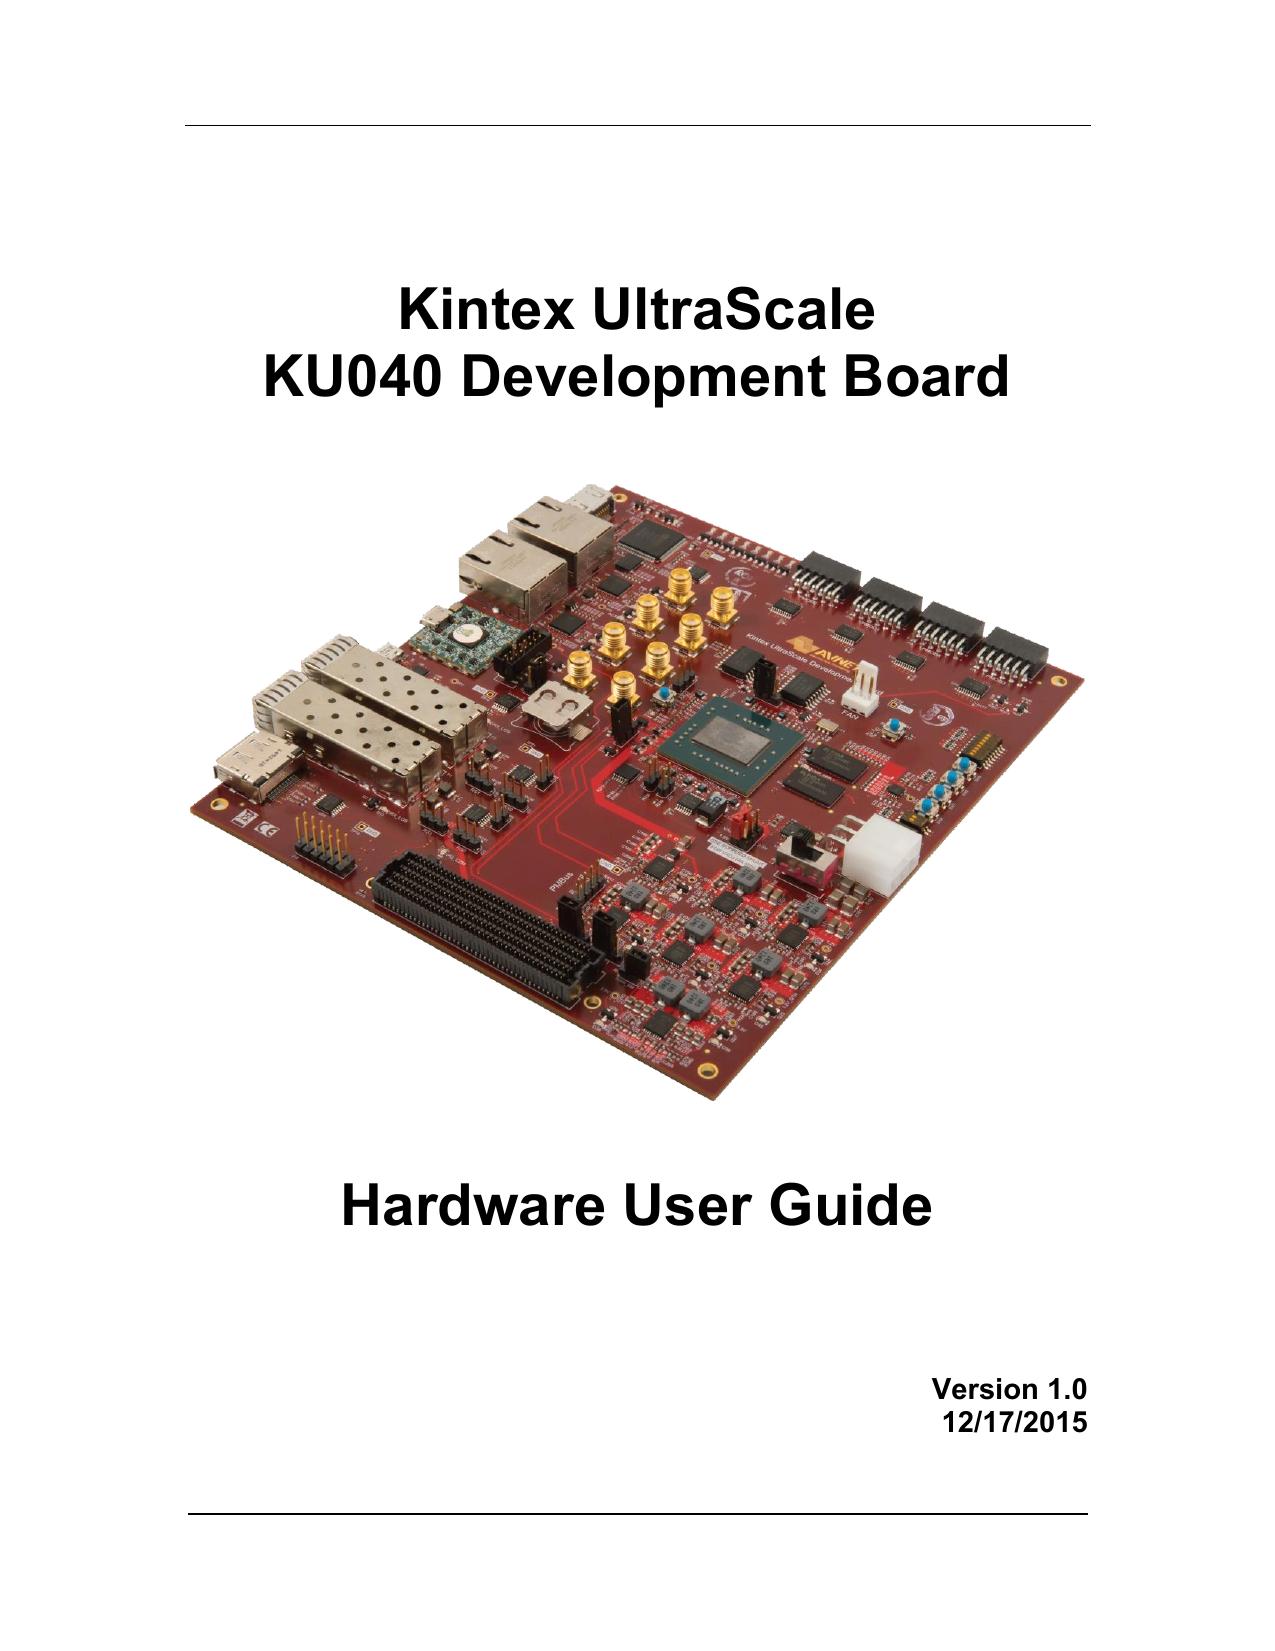 Kintex UltraScale KU040 Development Board Hardware User Guide